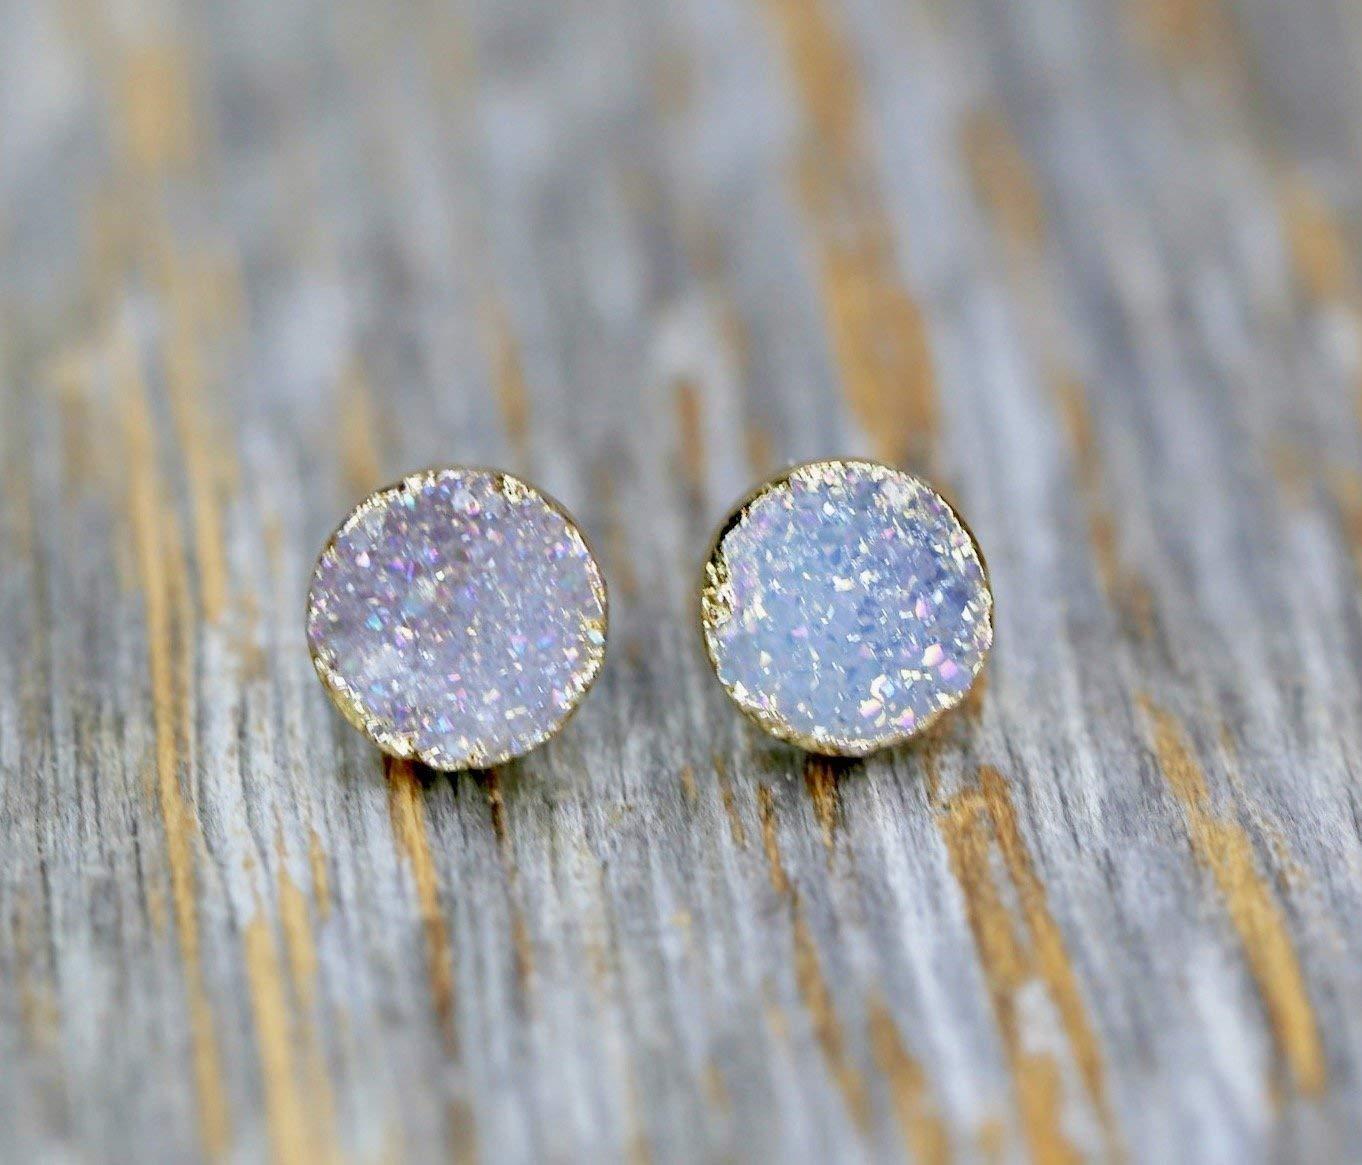 White Lilac Natural Druzy Stud Earring Real Genuine Druzy Quartz Gemstone- 8mm